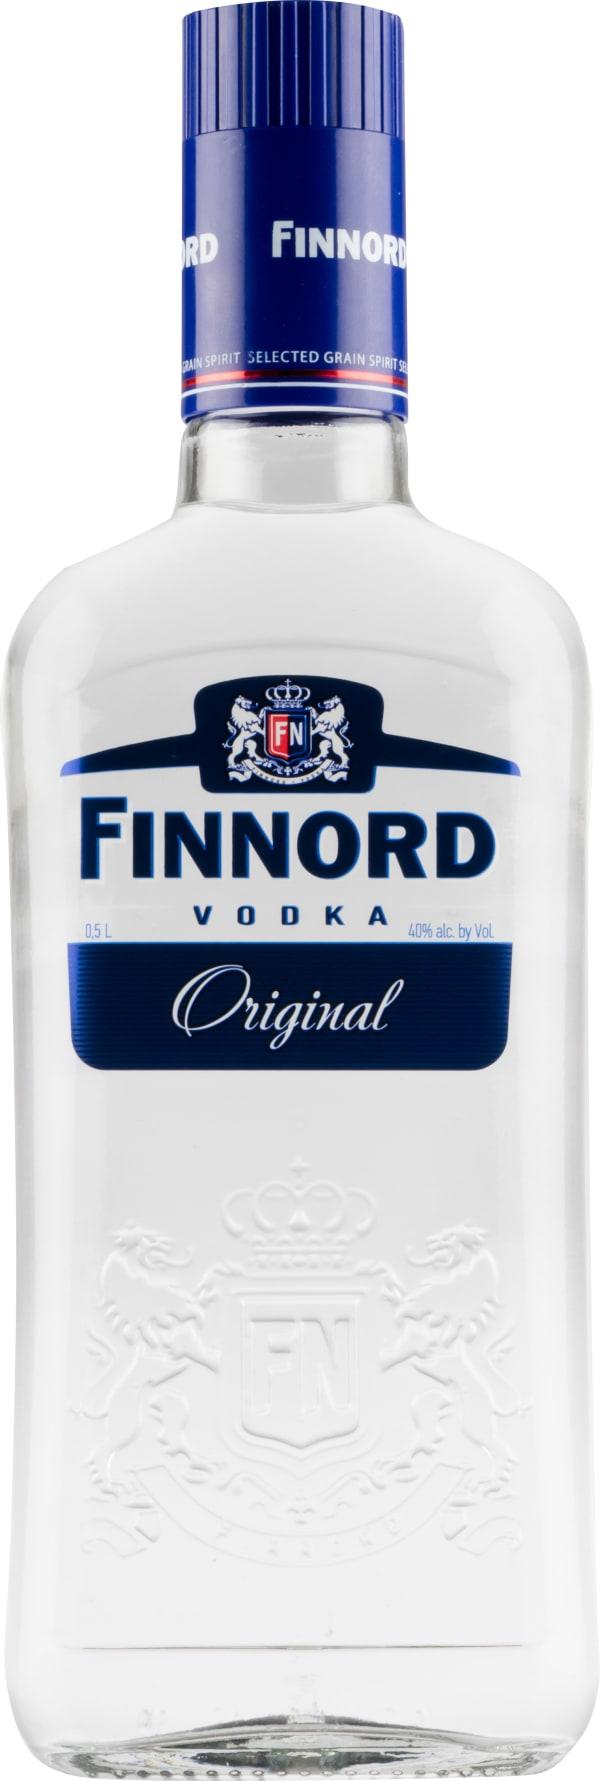 Finnord Original